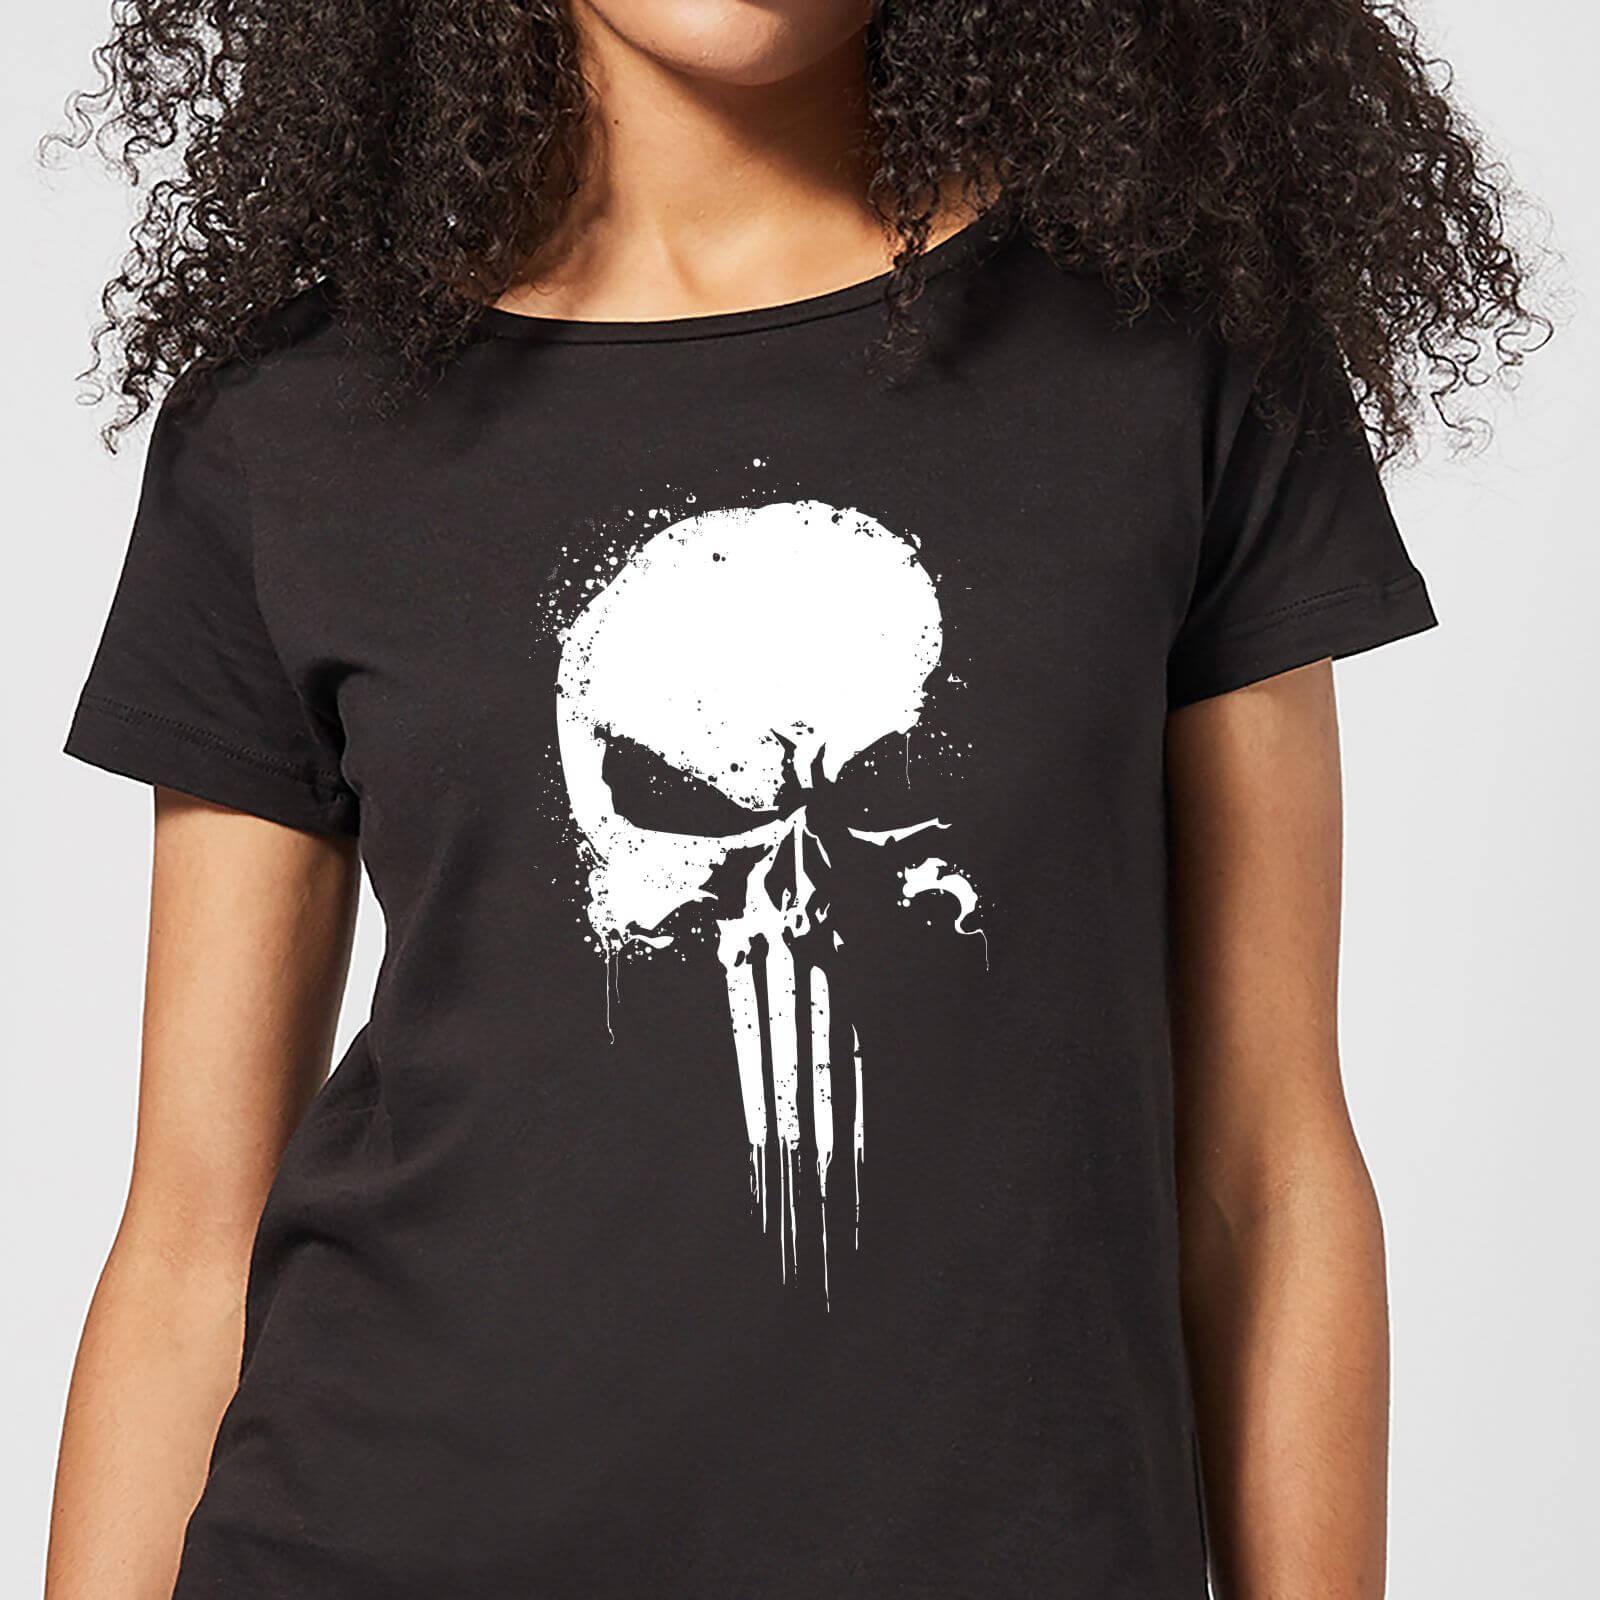 Marvel Punisher Women's T-Shirt - Black - XL - Black